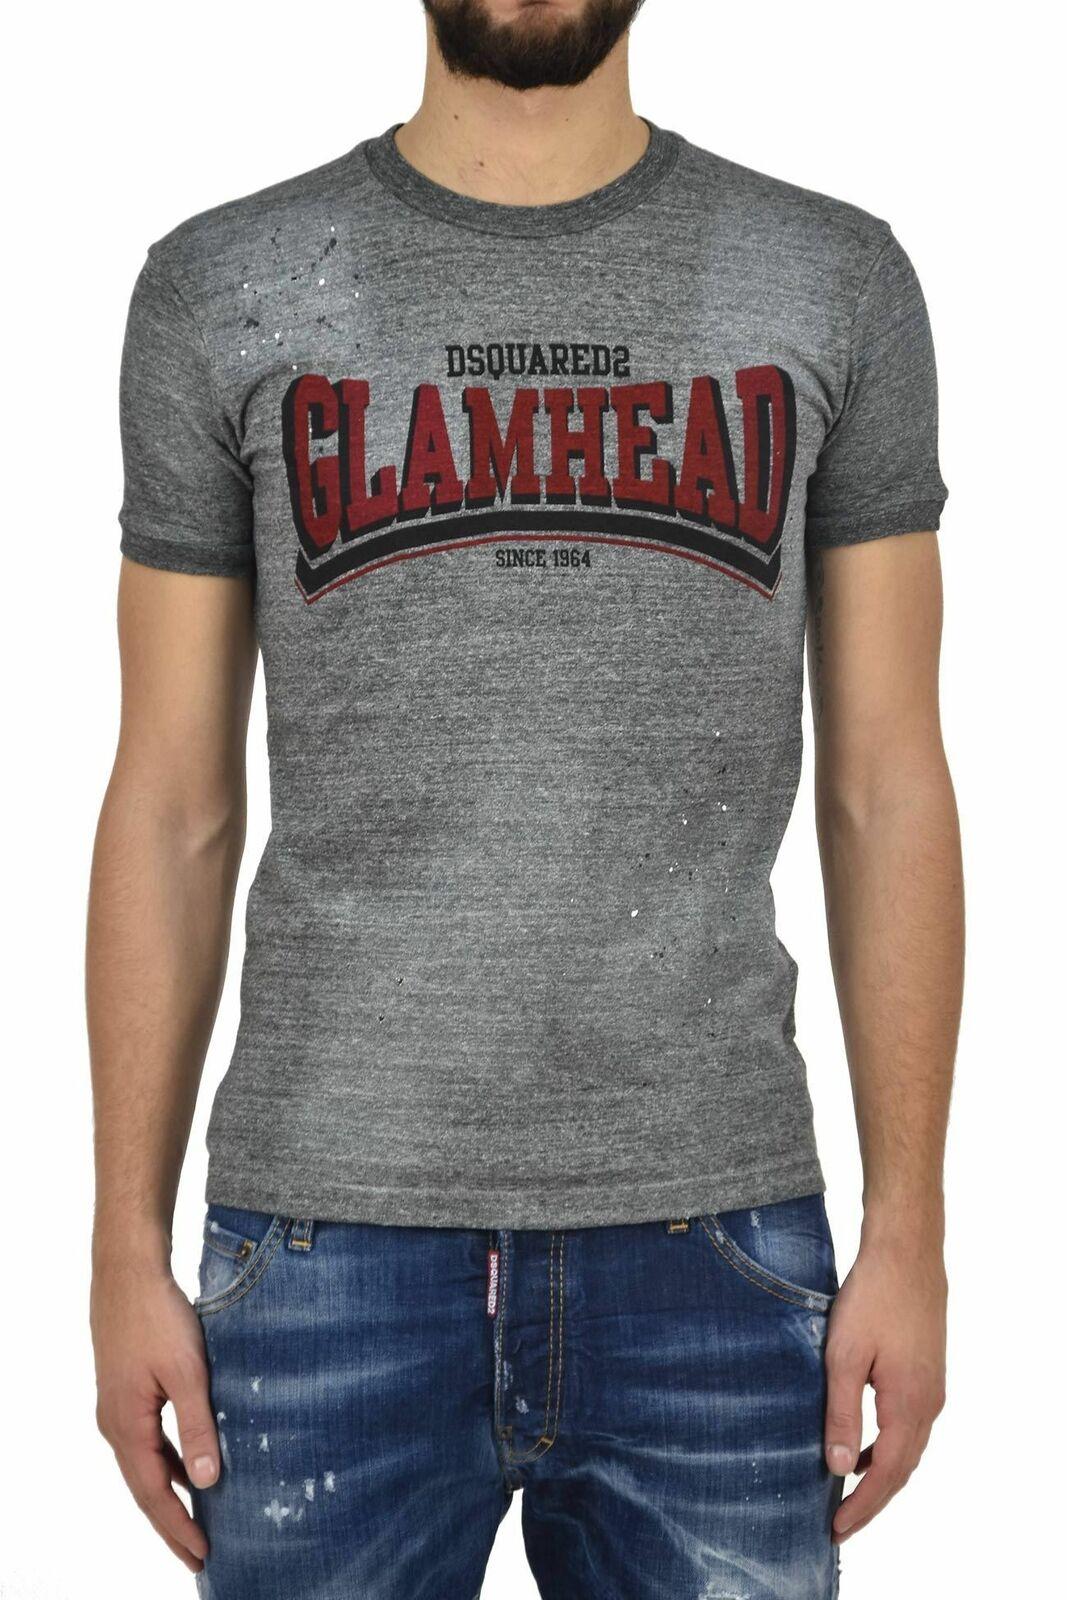 Dsquarot2 T-hemd GLAMHEAD männer - Größe  S - Nuevo